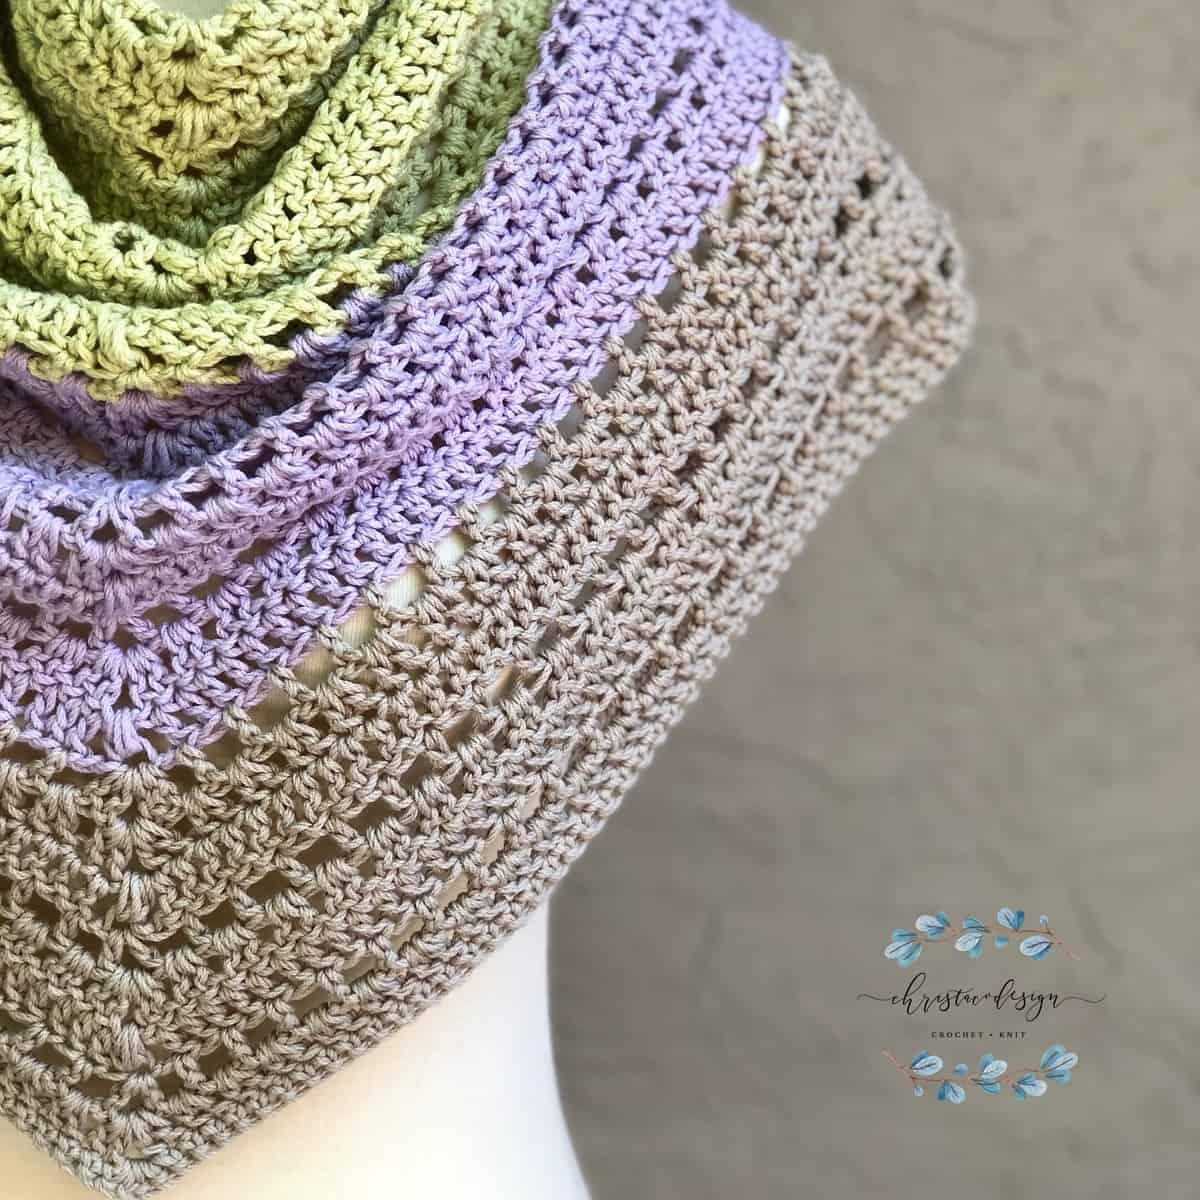 Lightweight summer crochet triangle shawl pattern in beige, purple and green.